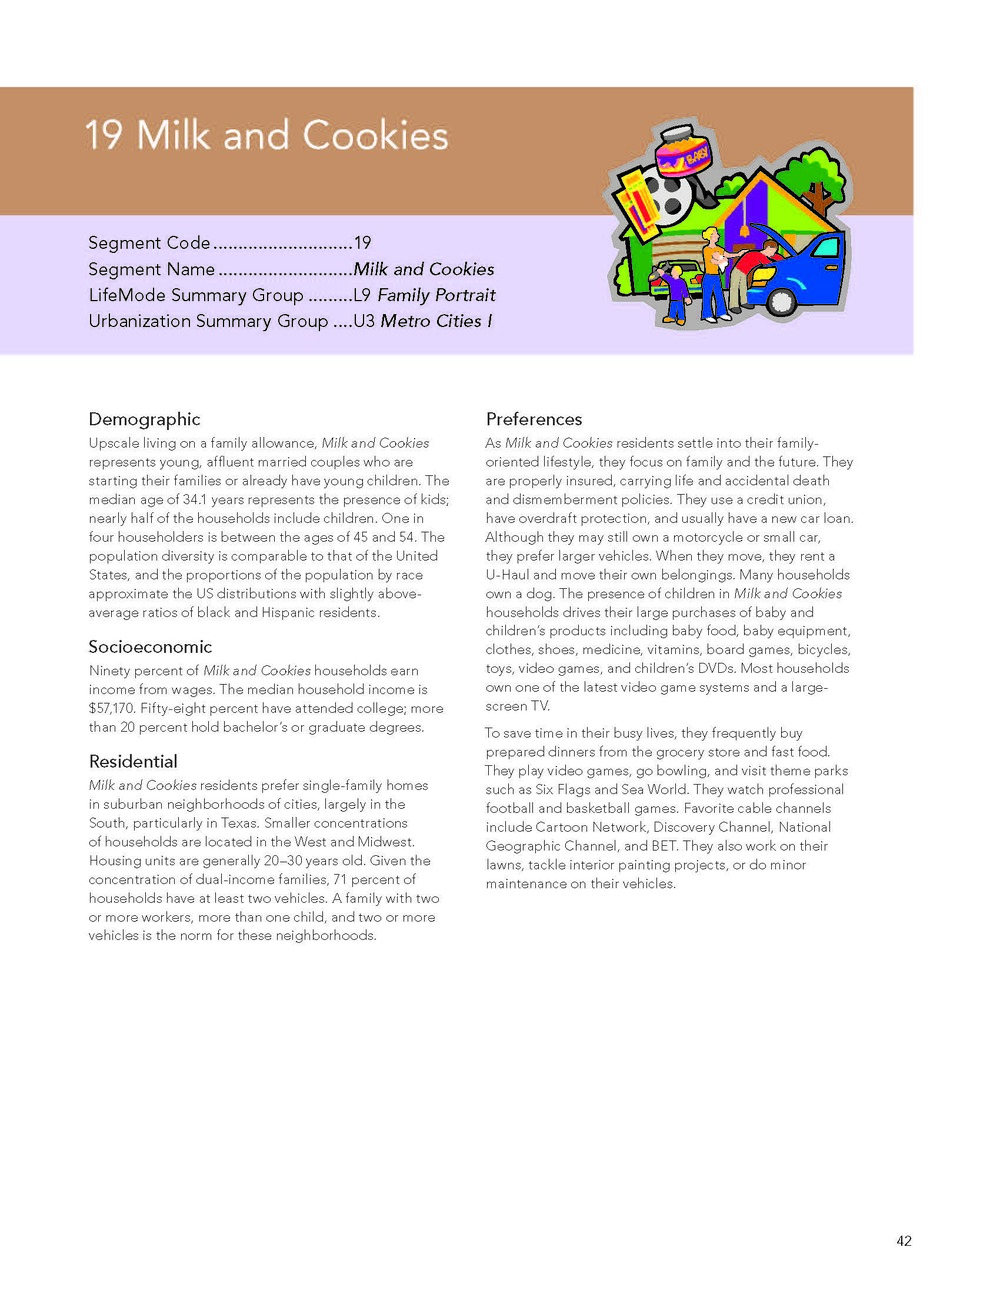 tapestry-segmentation_Page_45.jpg